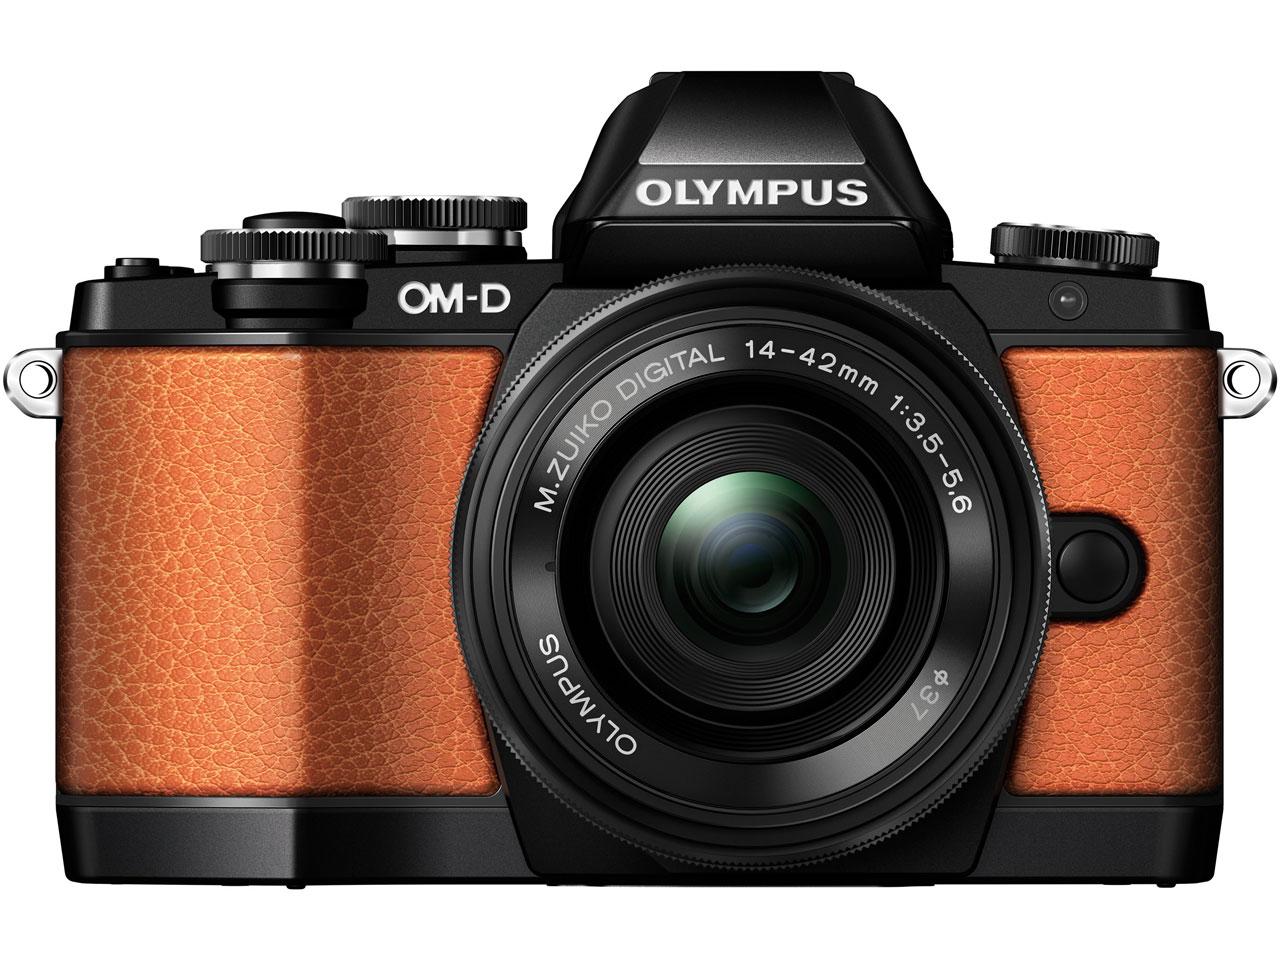 OLYMPUS OM-D E-M10 Limited Edition Kit [オレンジ] の製品画像